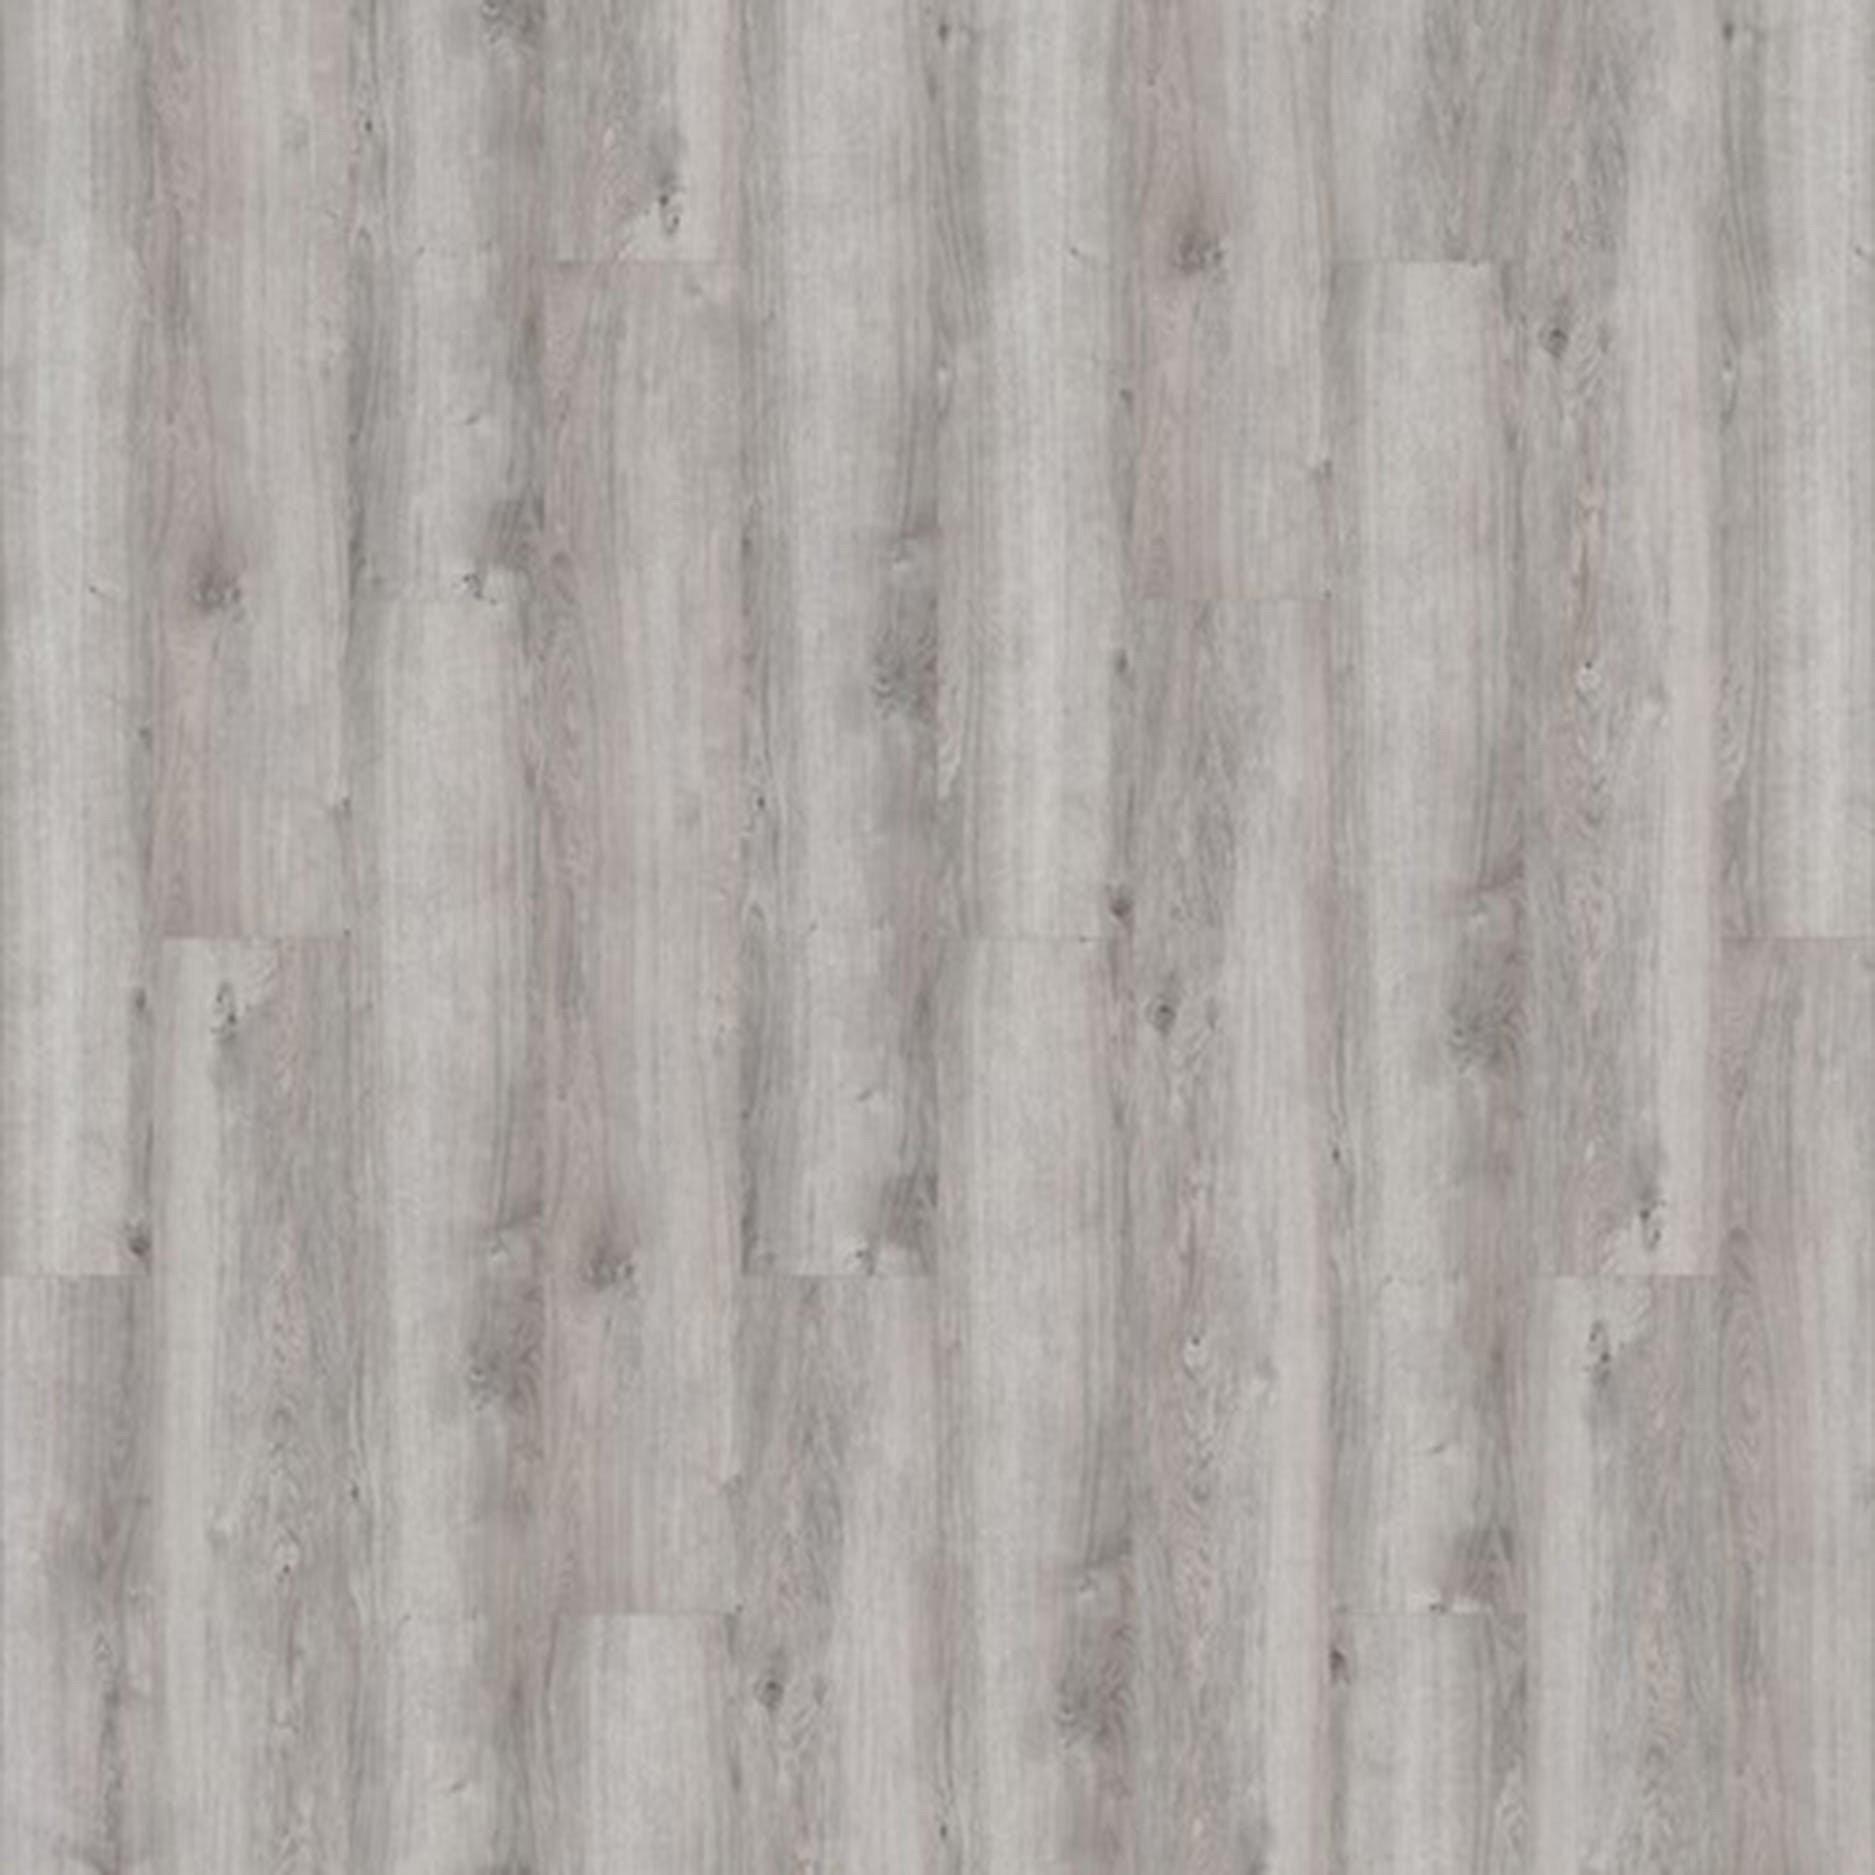 Tarkett Starfloor Click Ultimate Stylish Oak Grey oJ609k